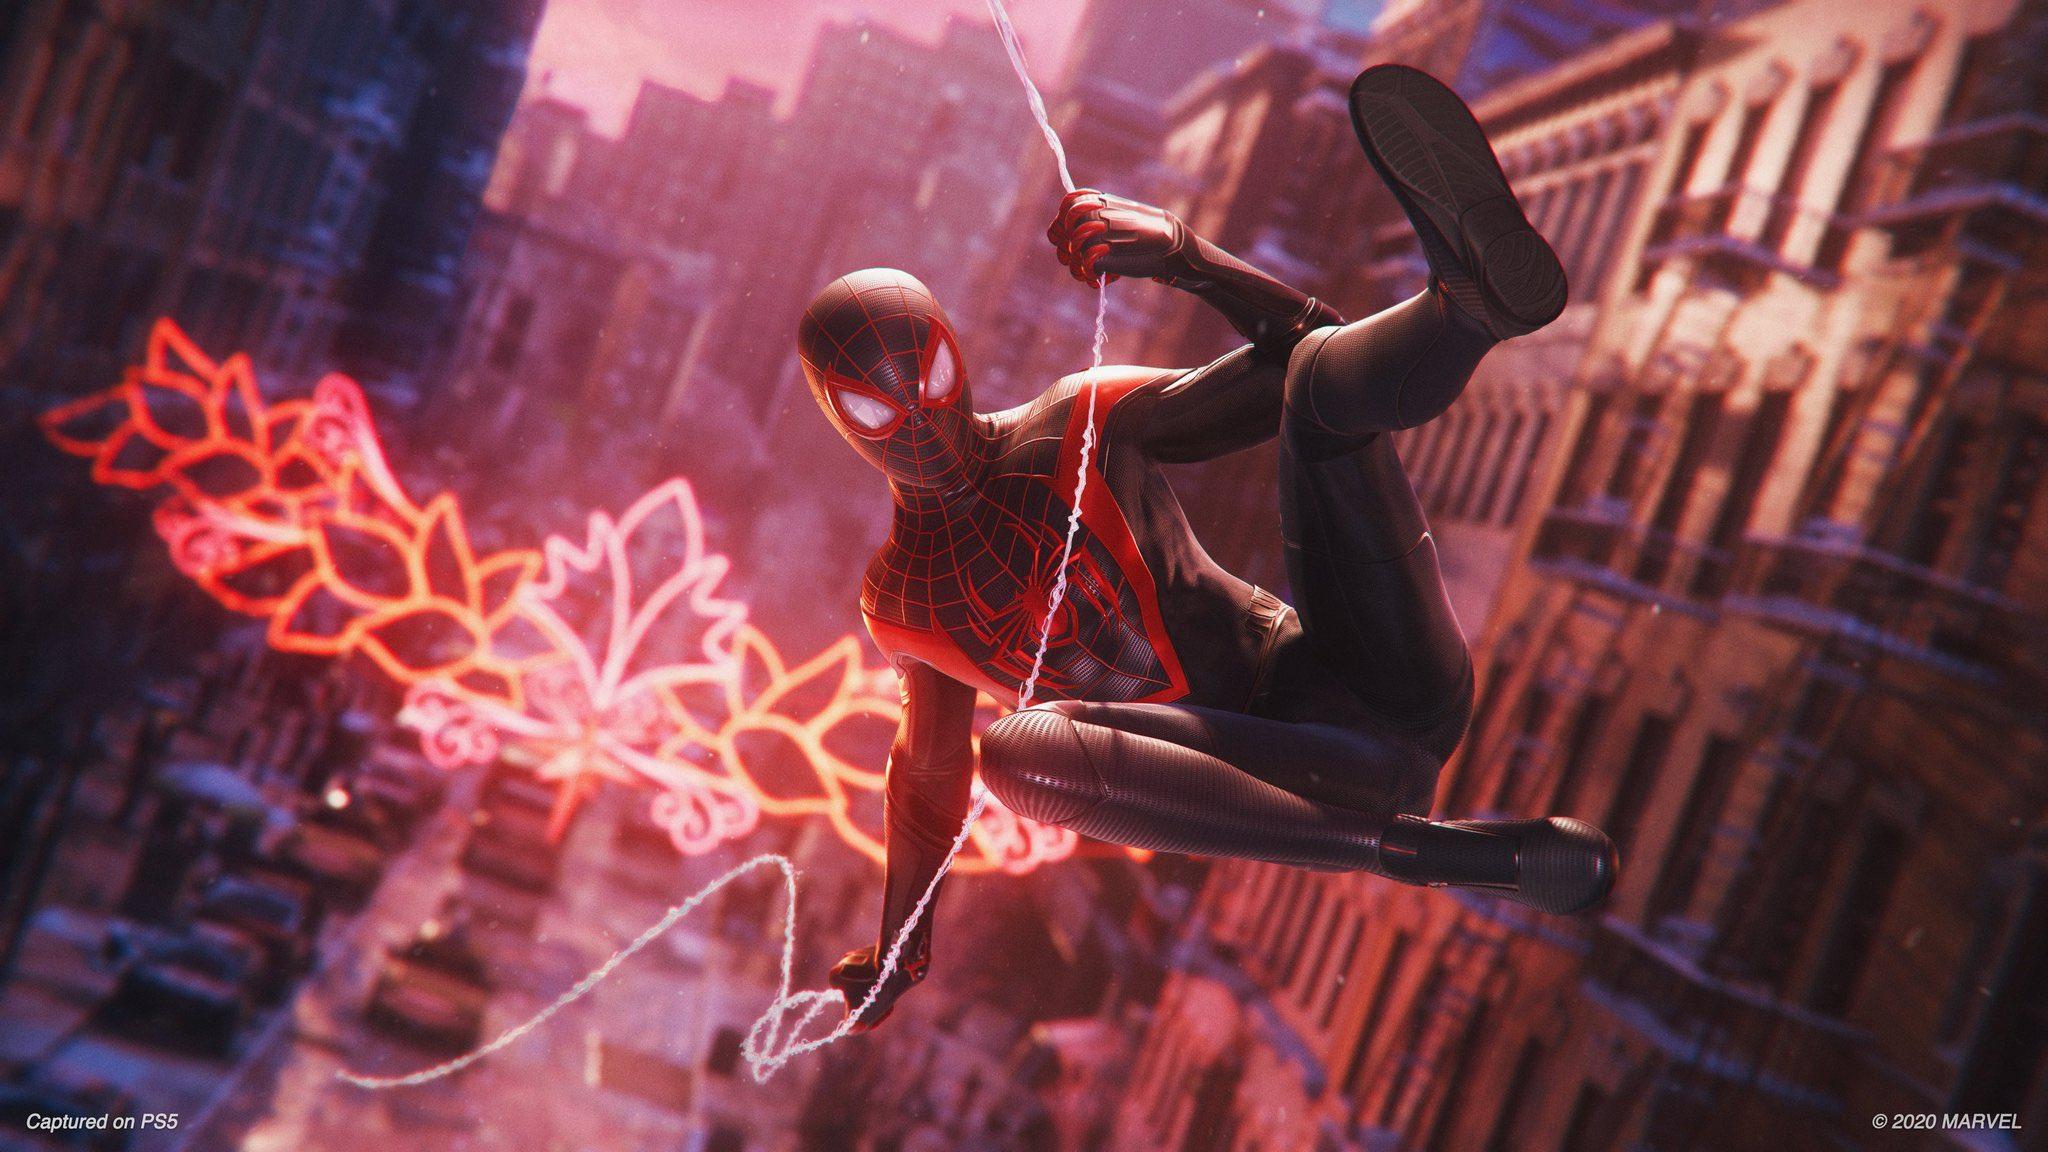 PS5 Marvels Spider-Man: Miles Morales Demons Souls File Size PS4